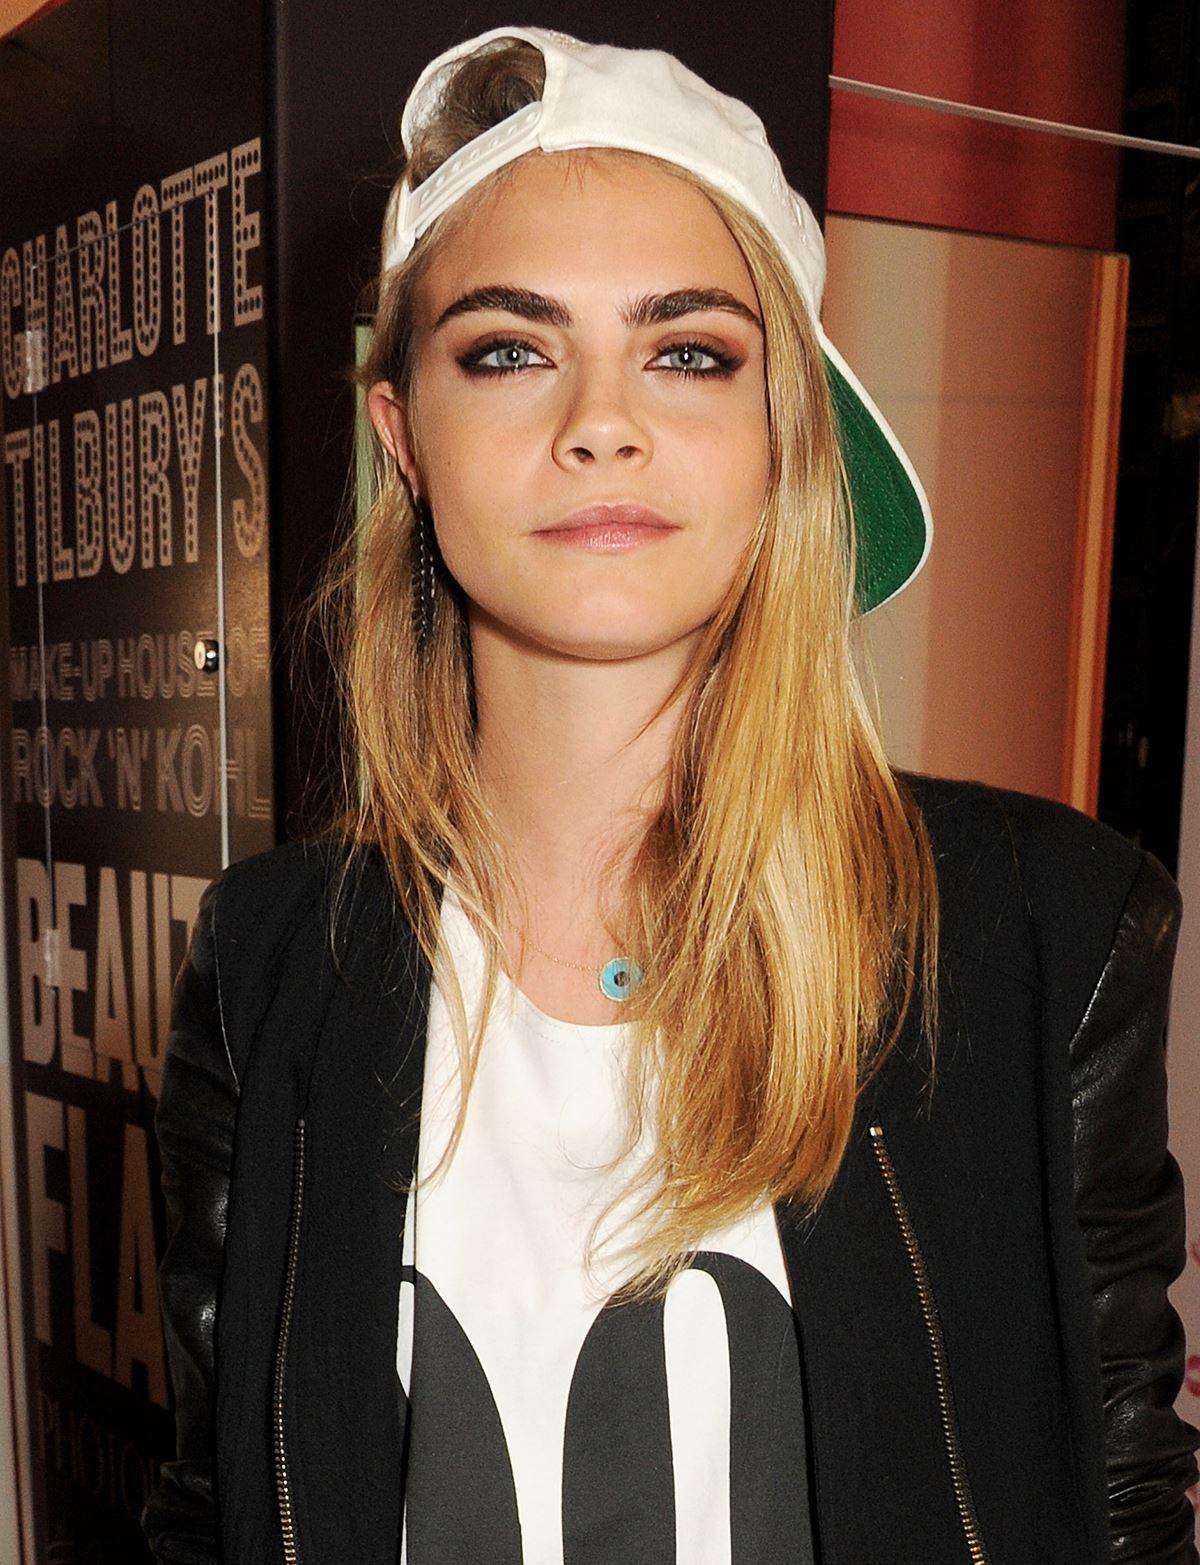 Backwards cap and eye brow game strong. #swag